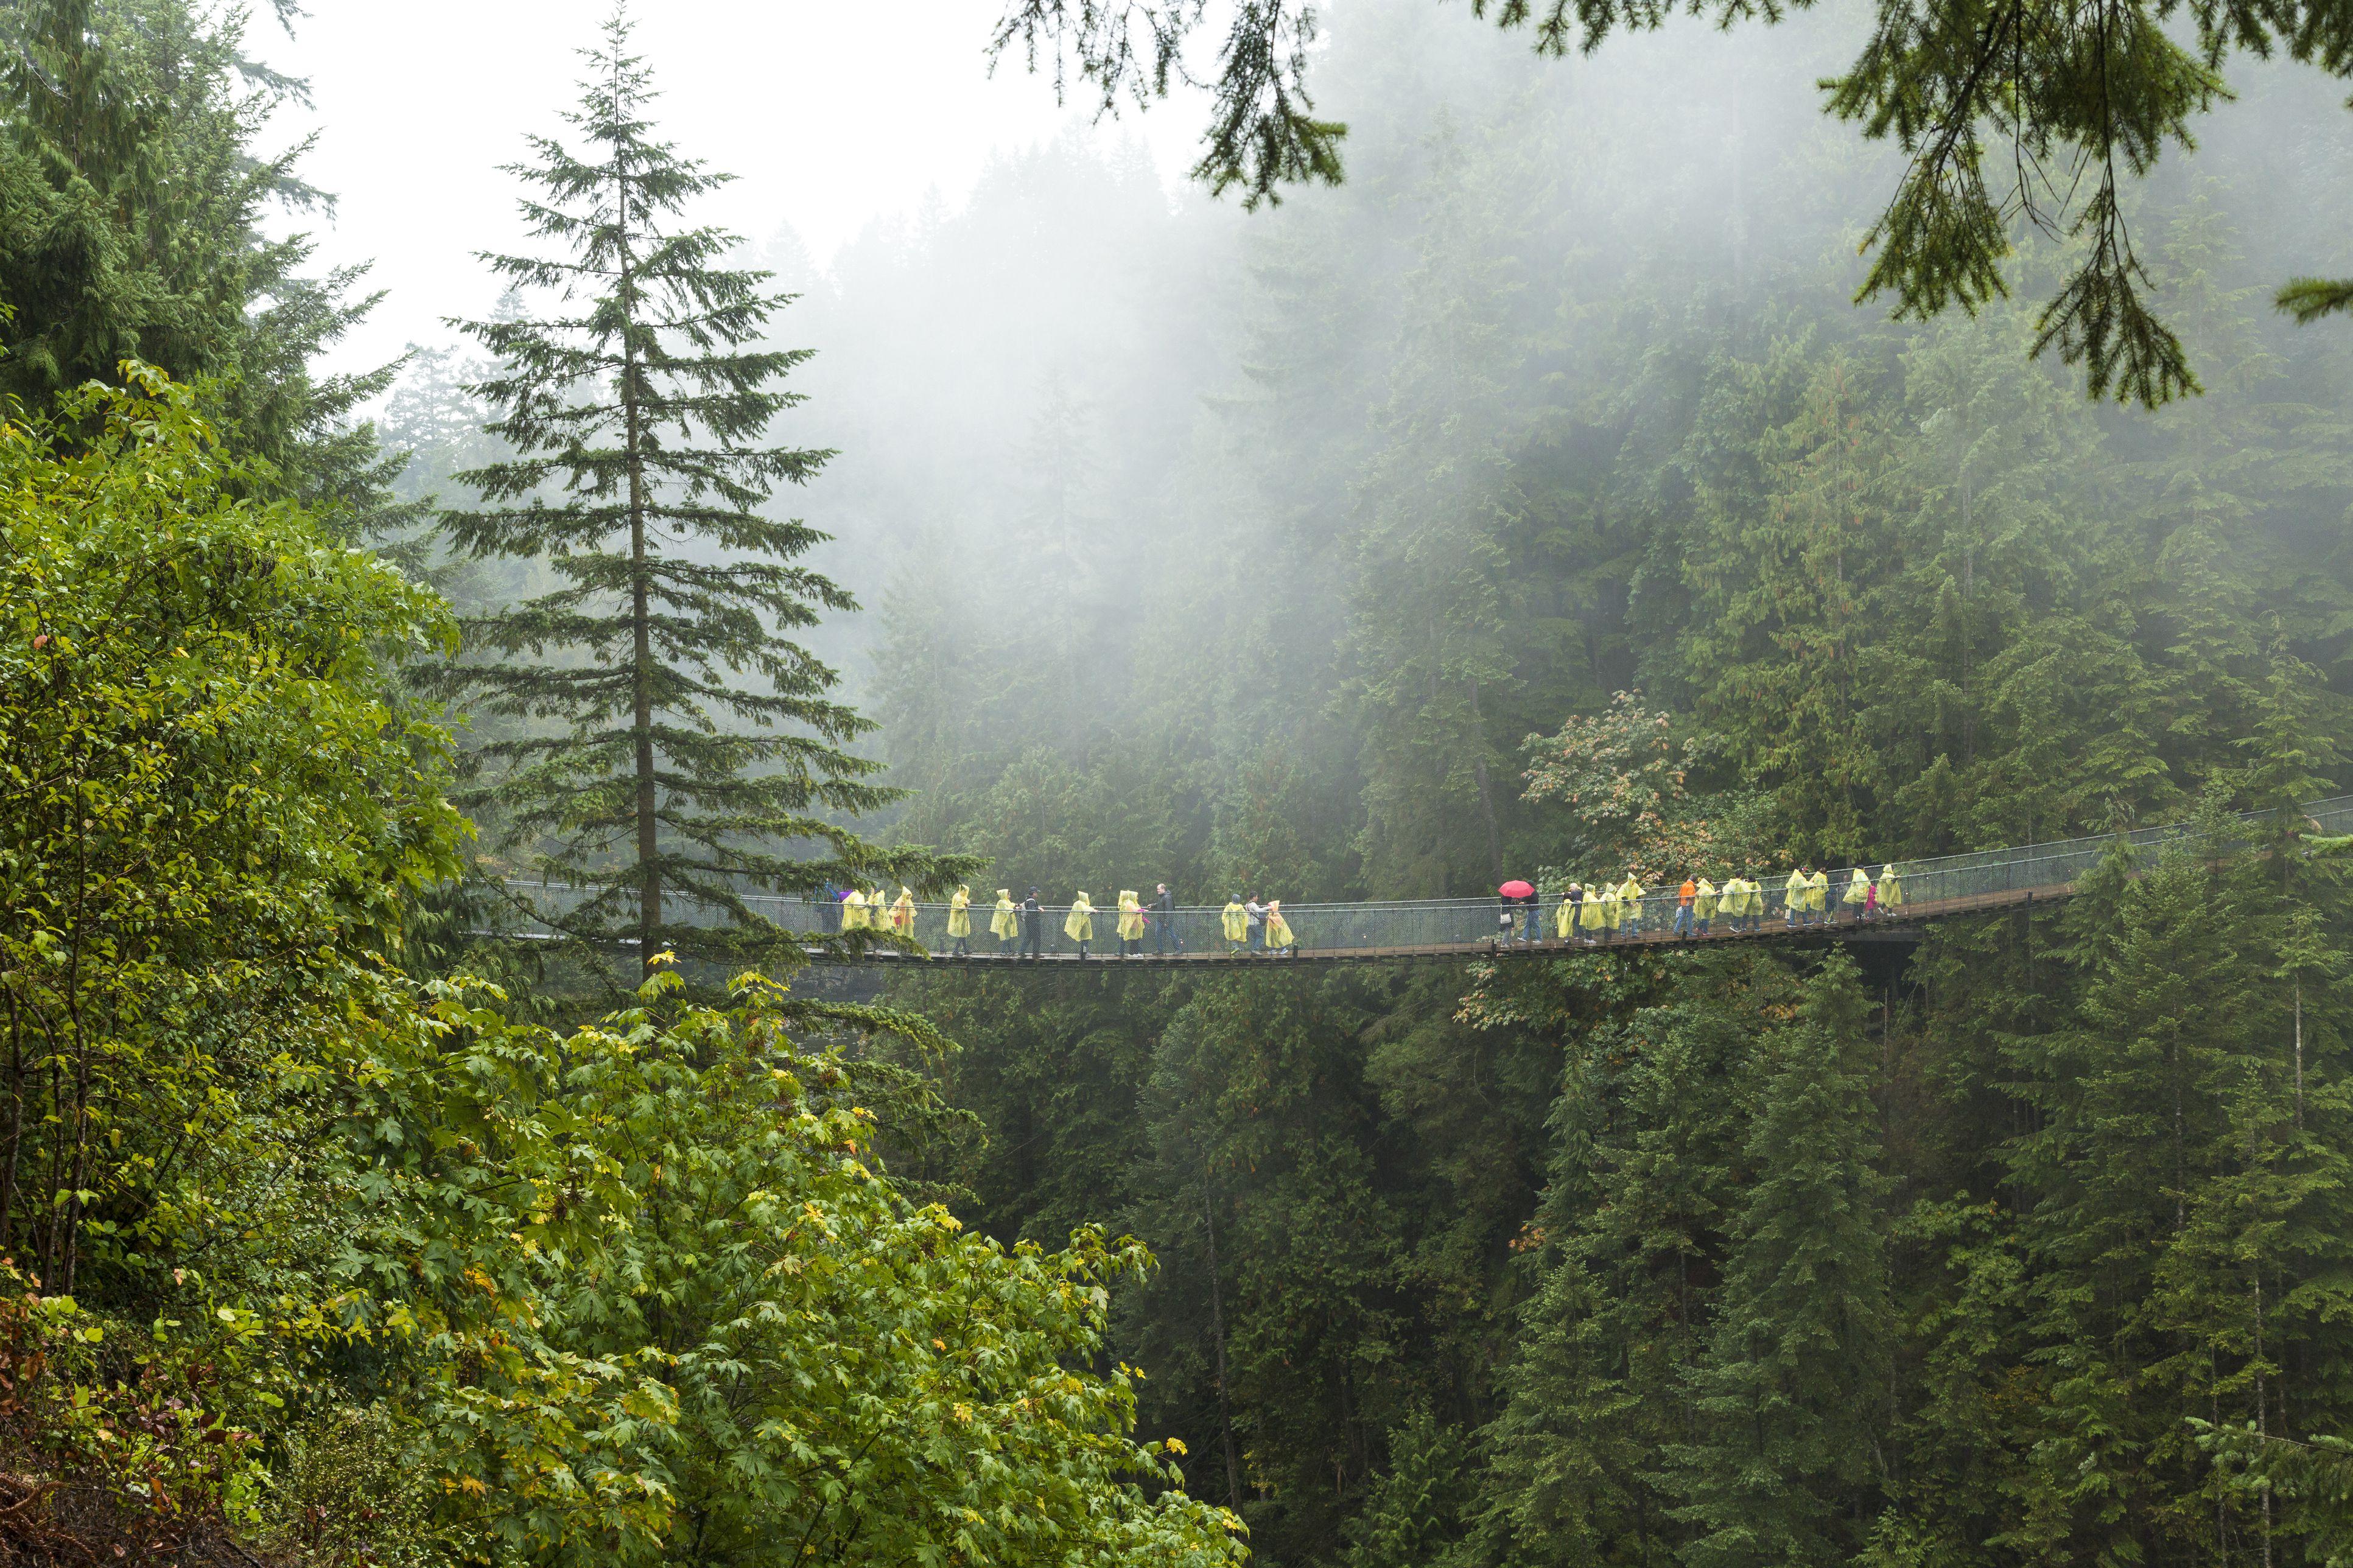 Tourists on Capilano Suspension Bridge and Park